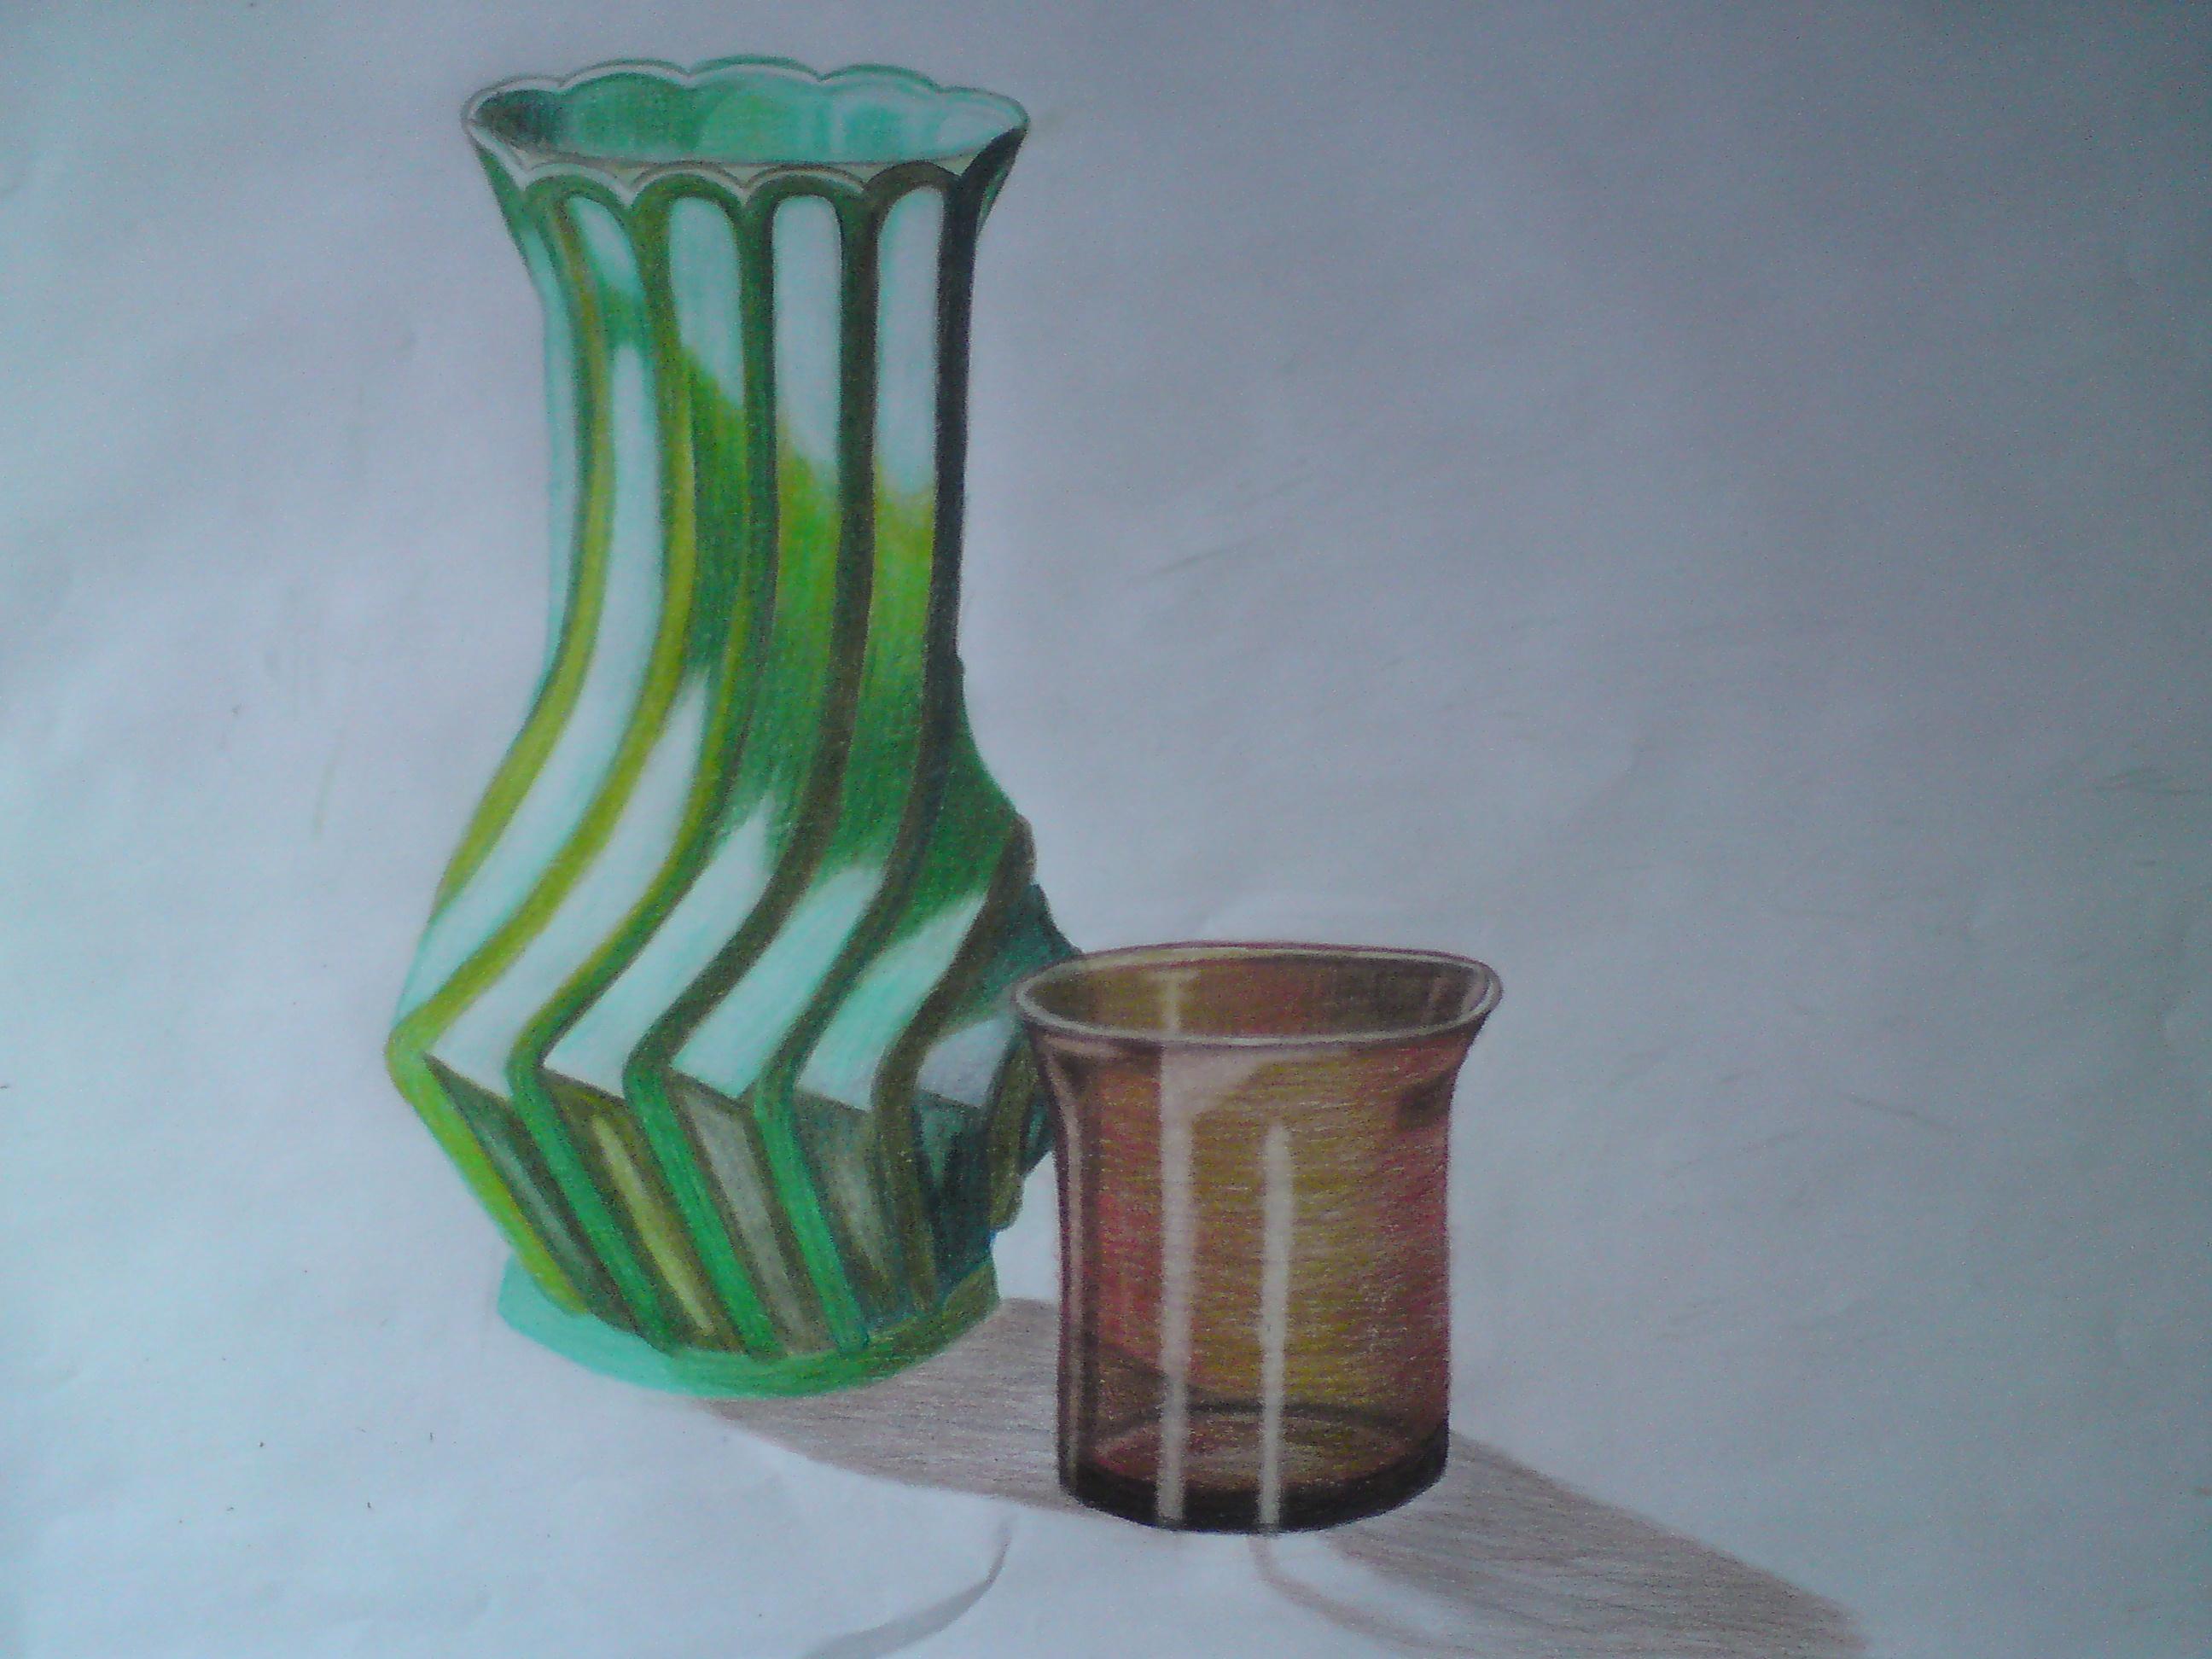 Drawn vase shadow And work assignment Ektah OCA